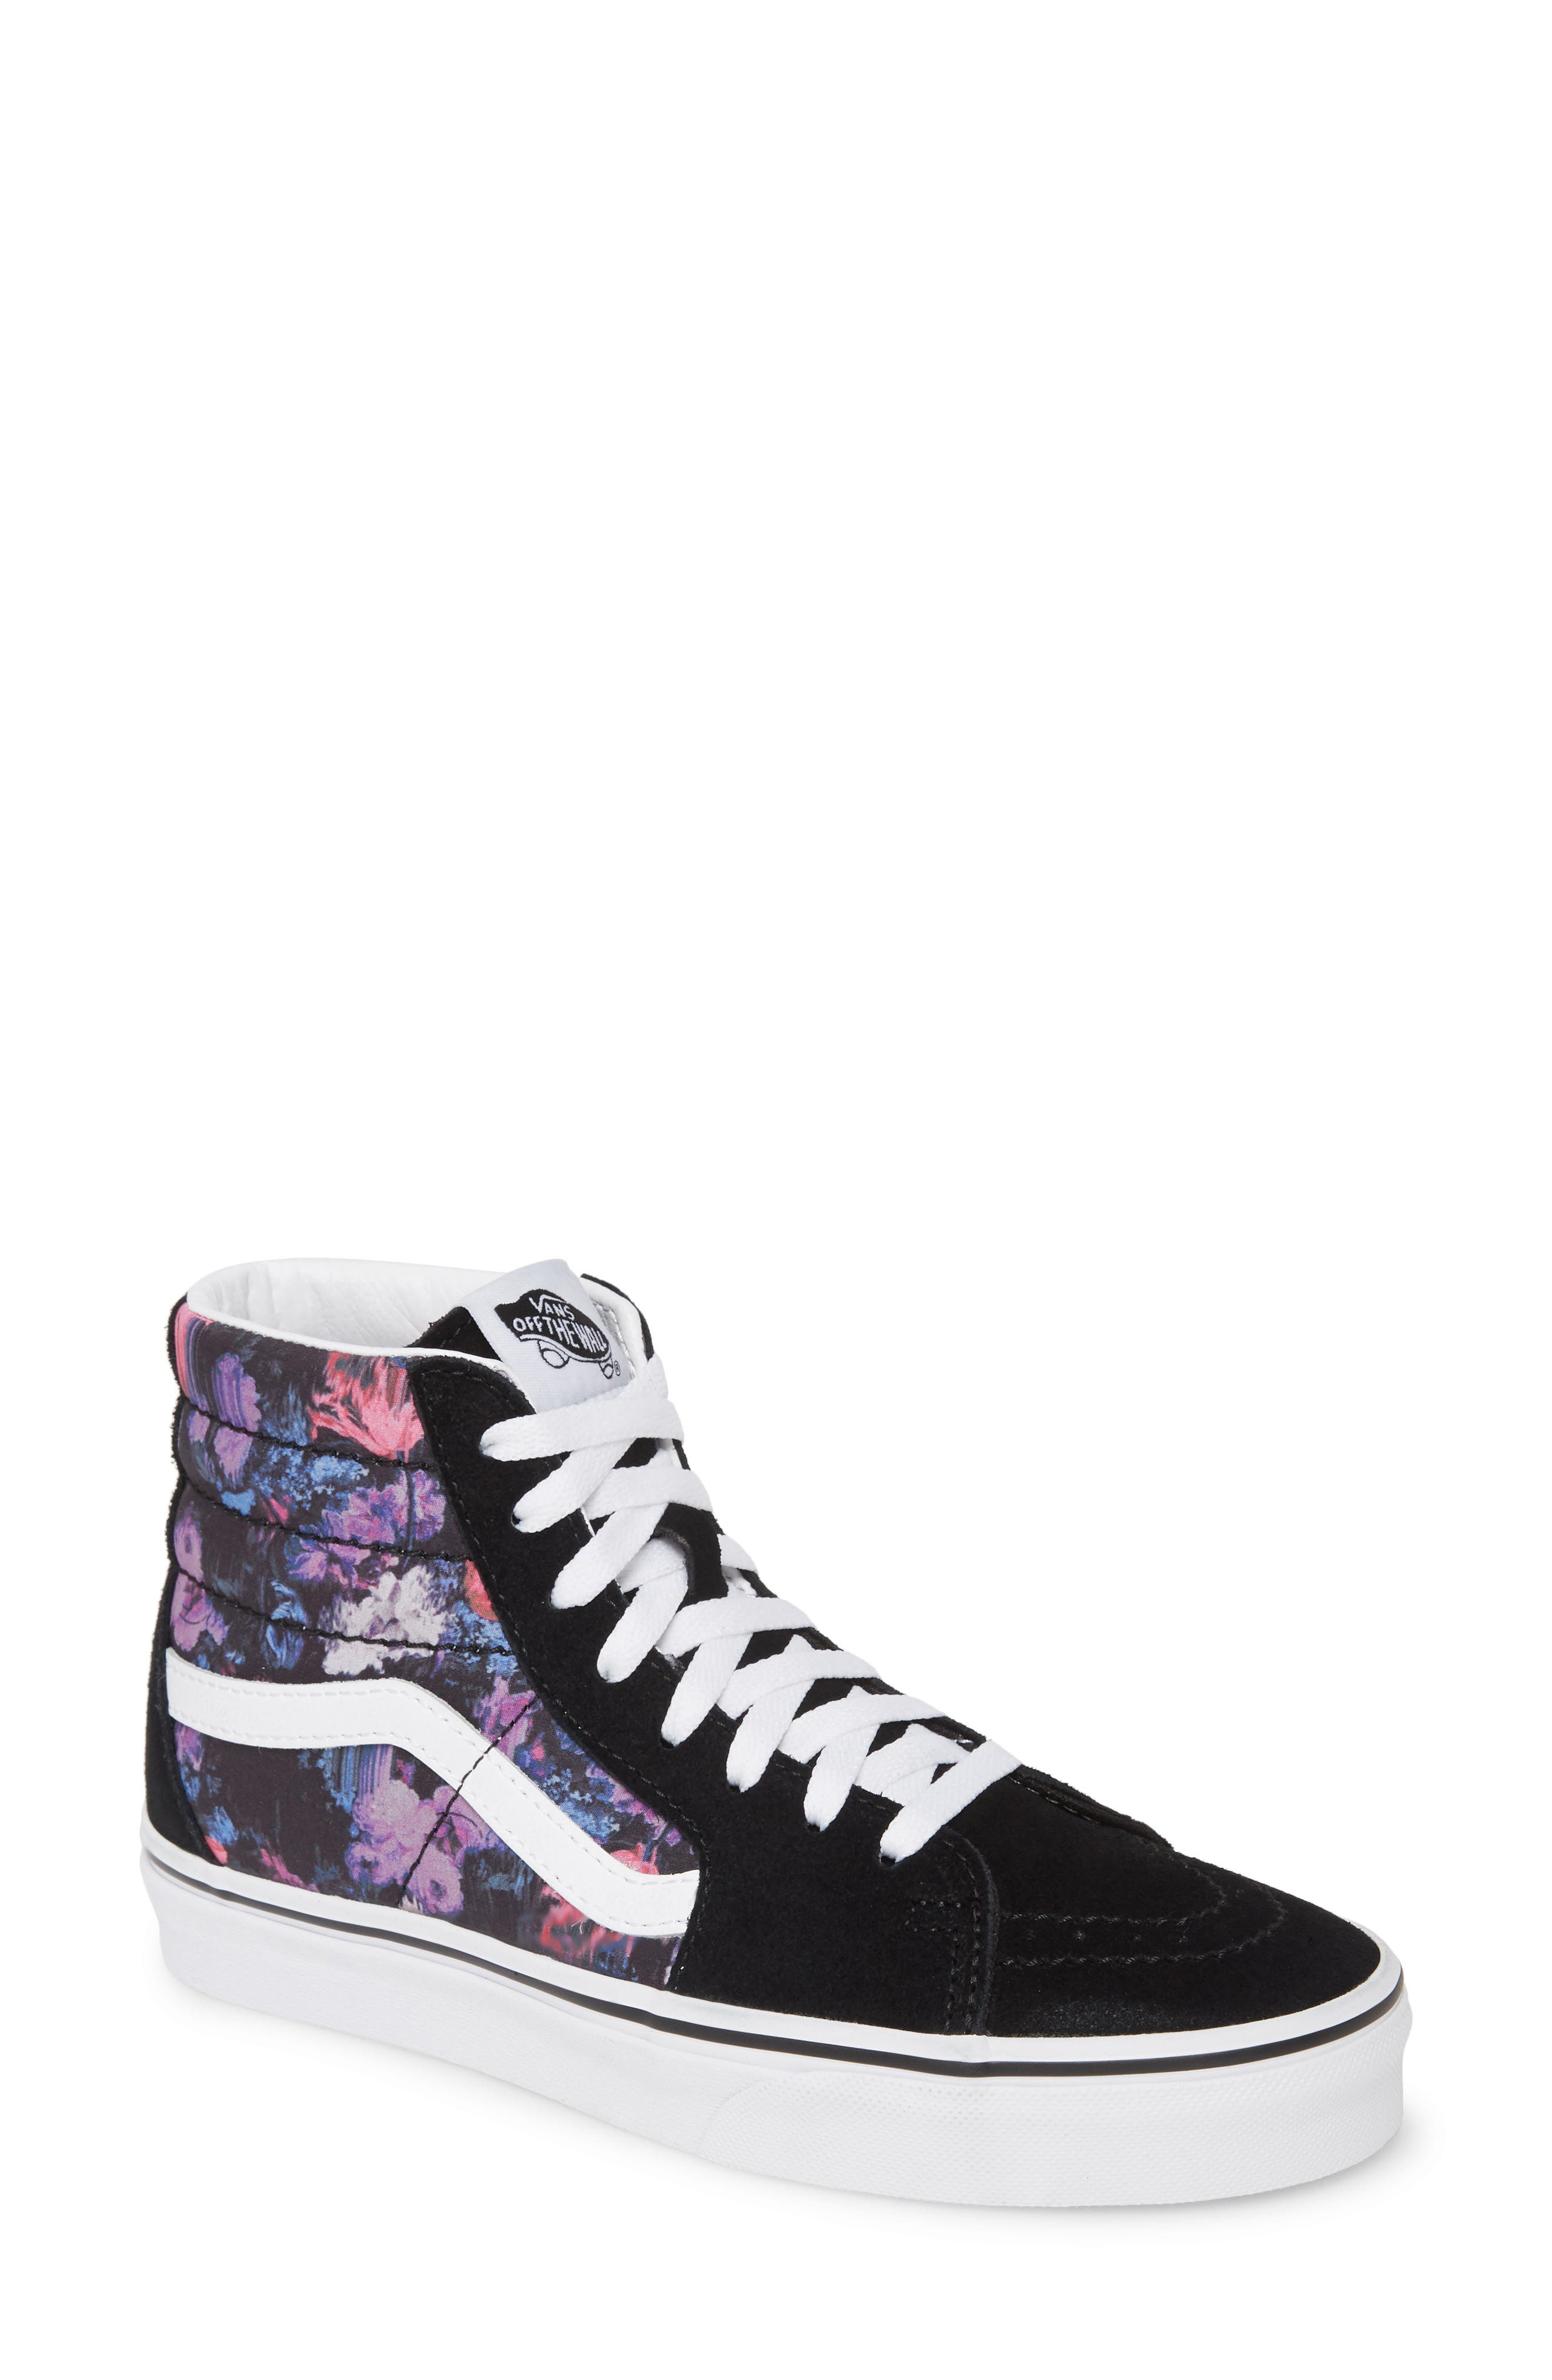 Vans Sk8-Hi Warped Floral Sneaker